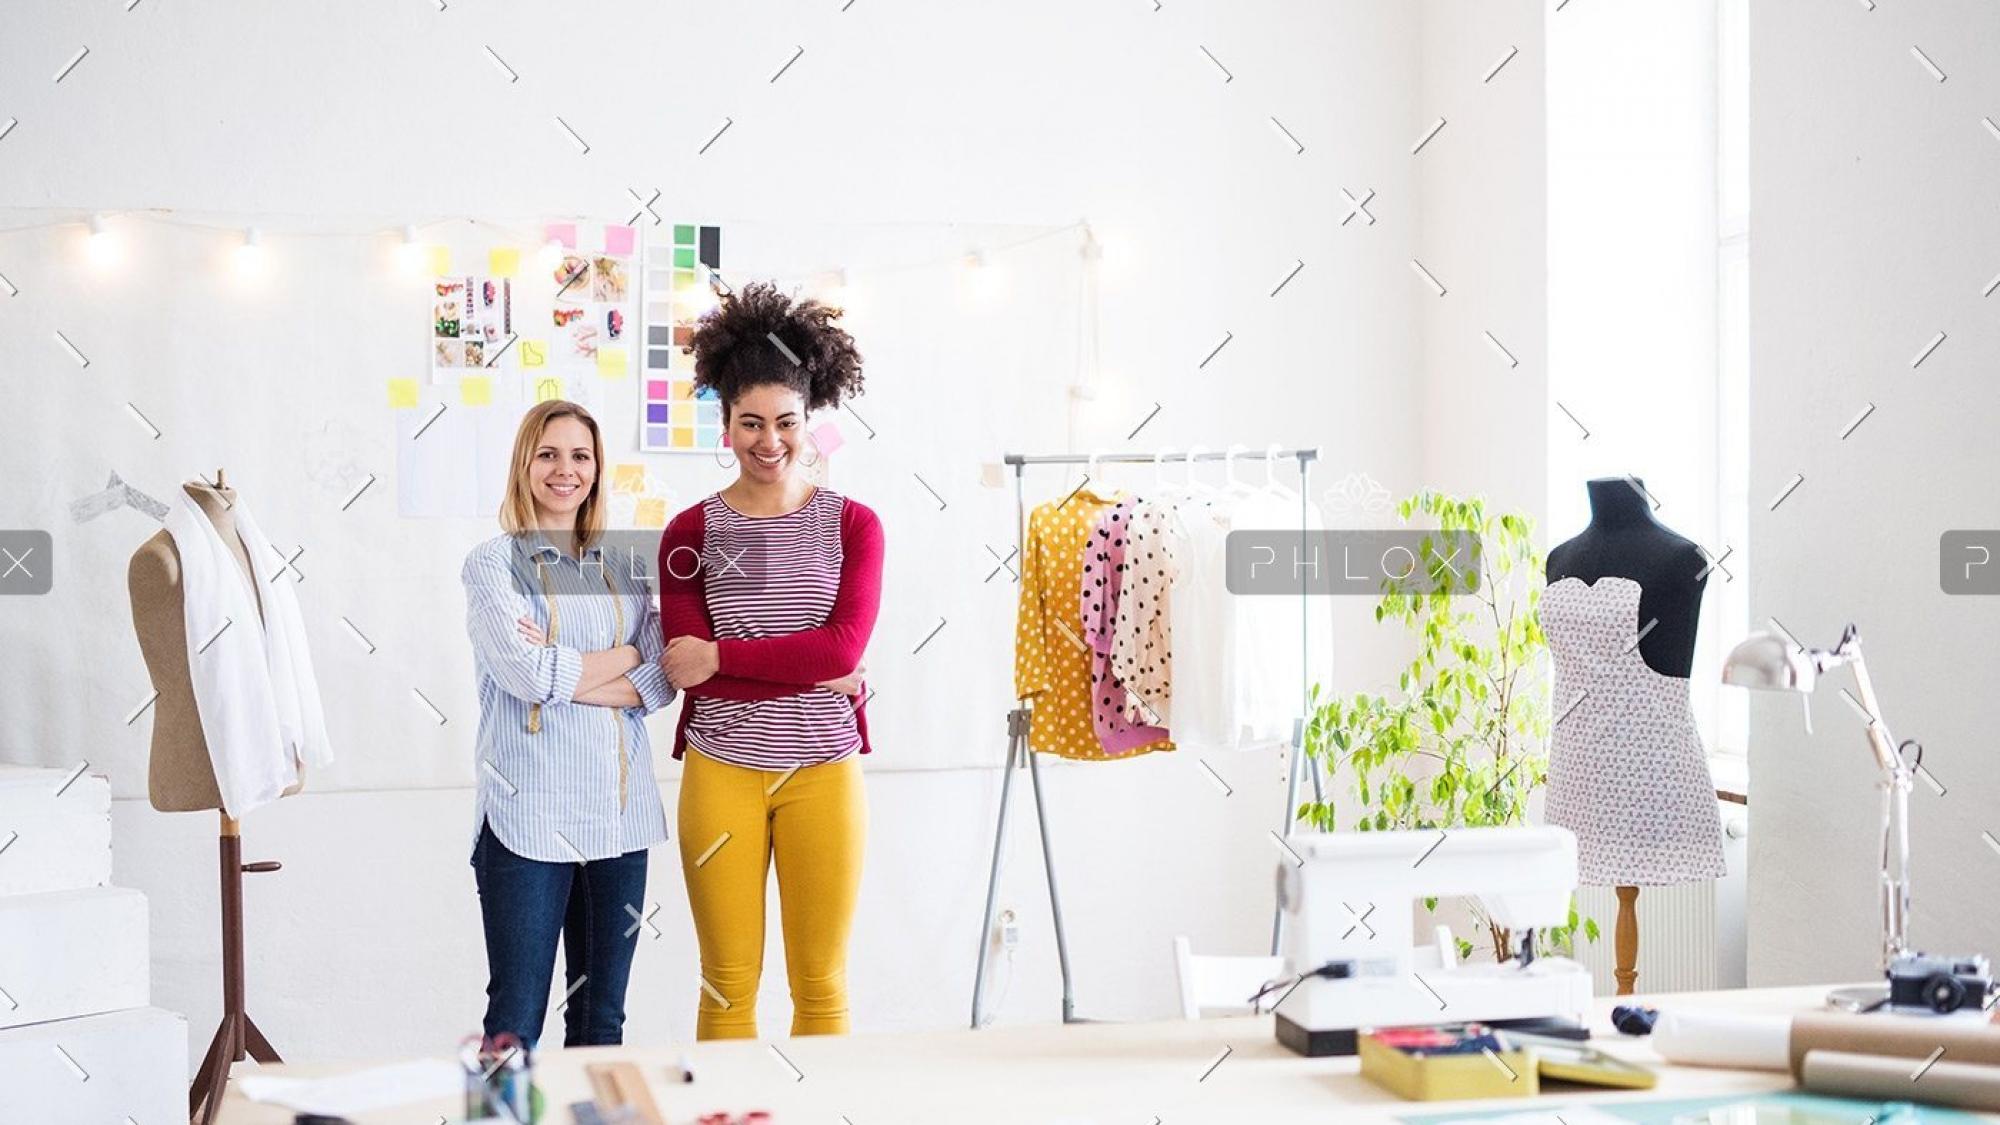 demo-attachment-68-young-creative-women-in-a-studio-startup-business-P3RGJTF